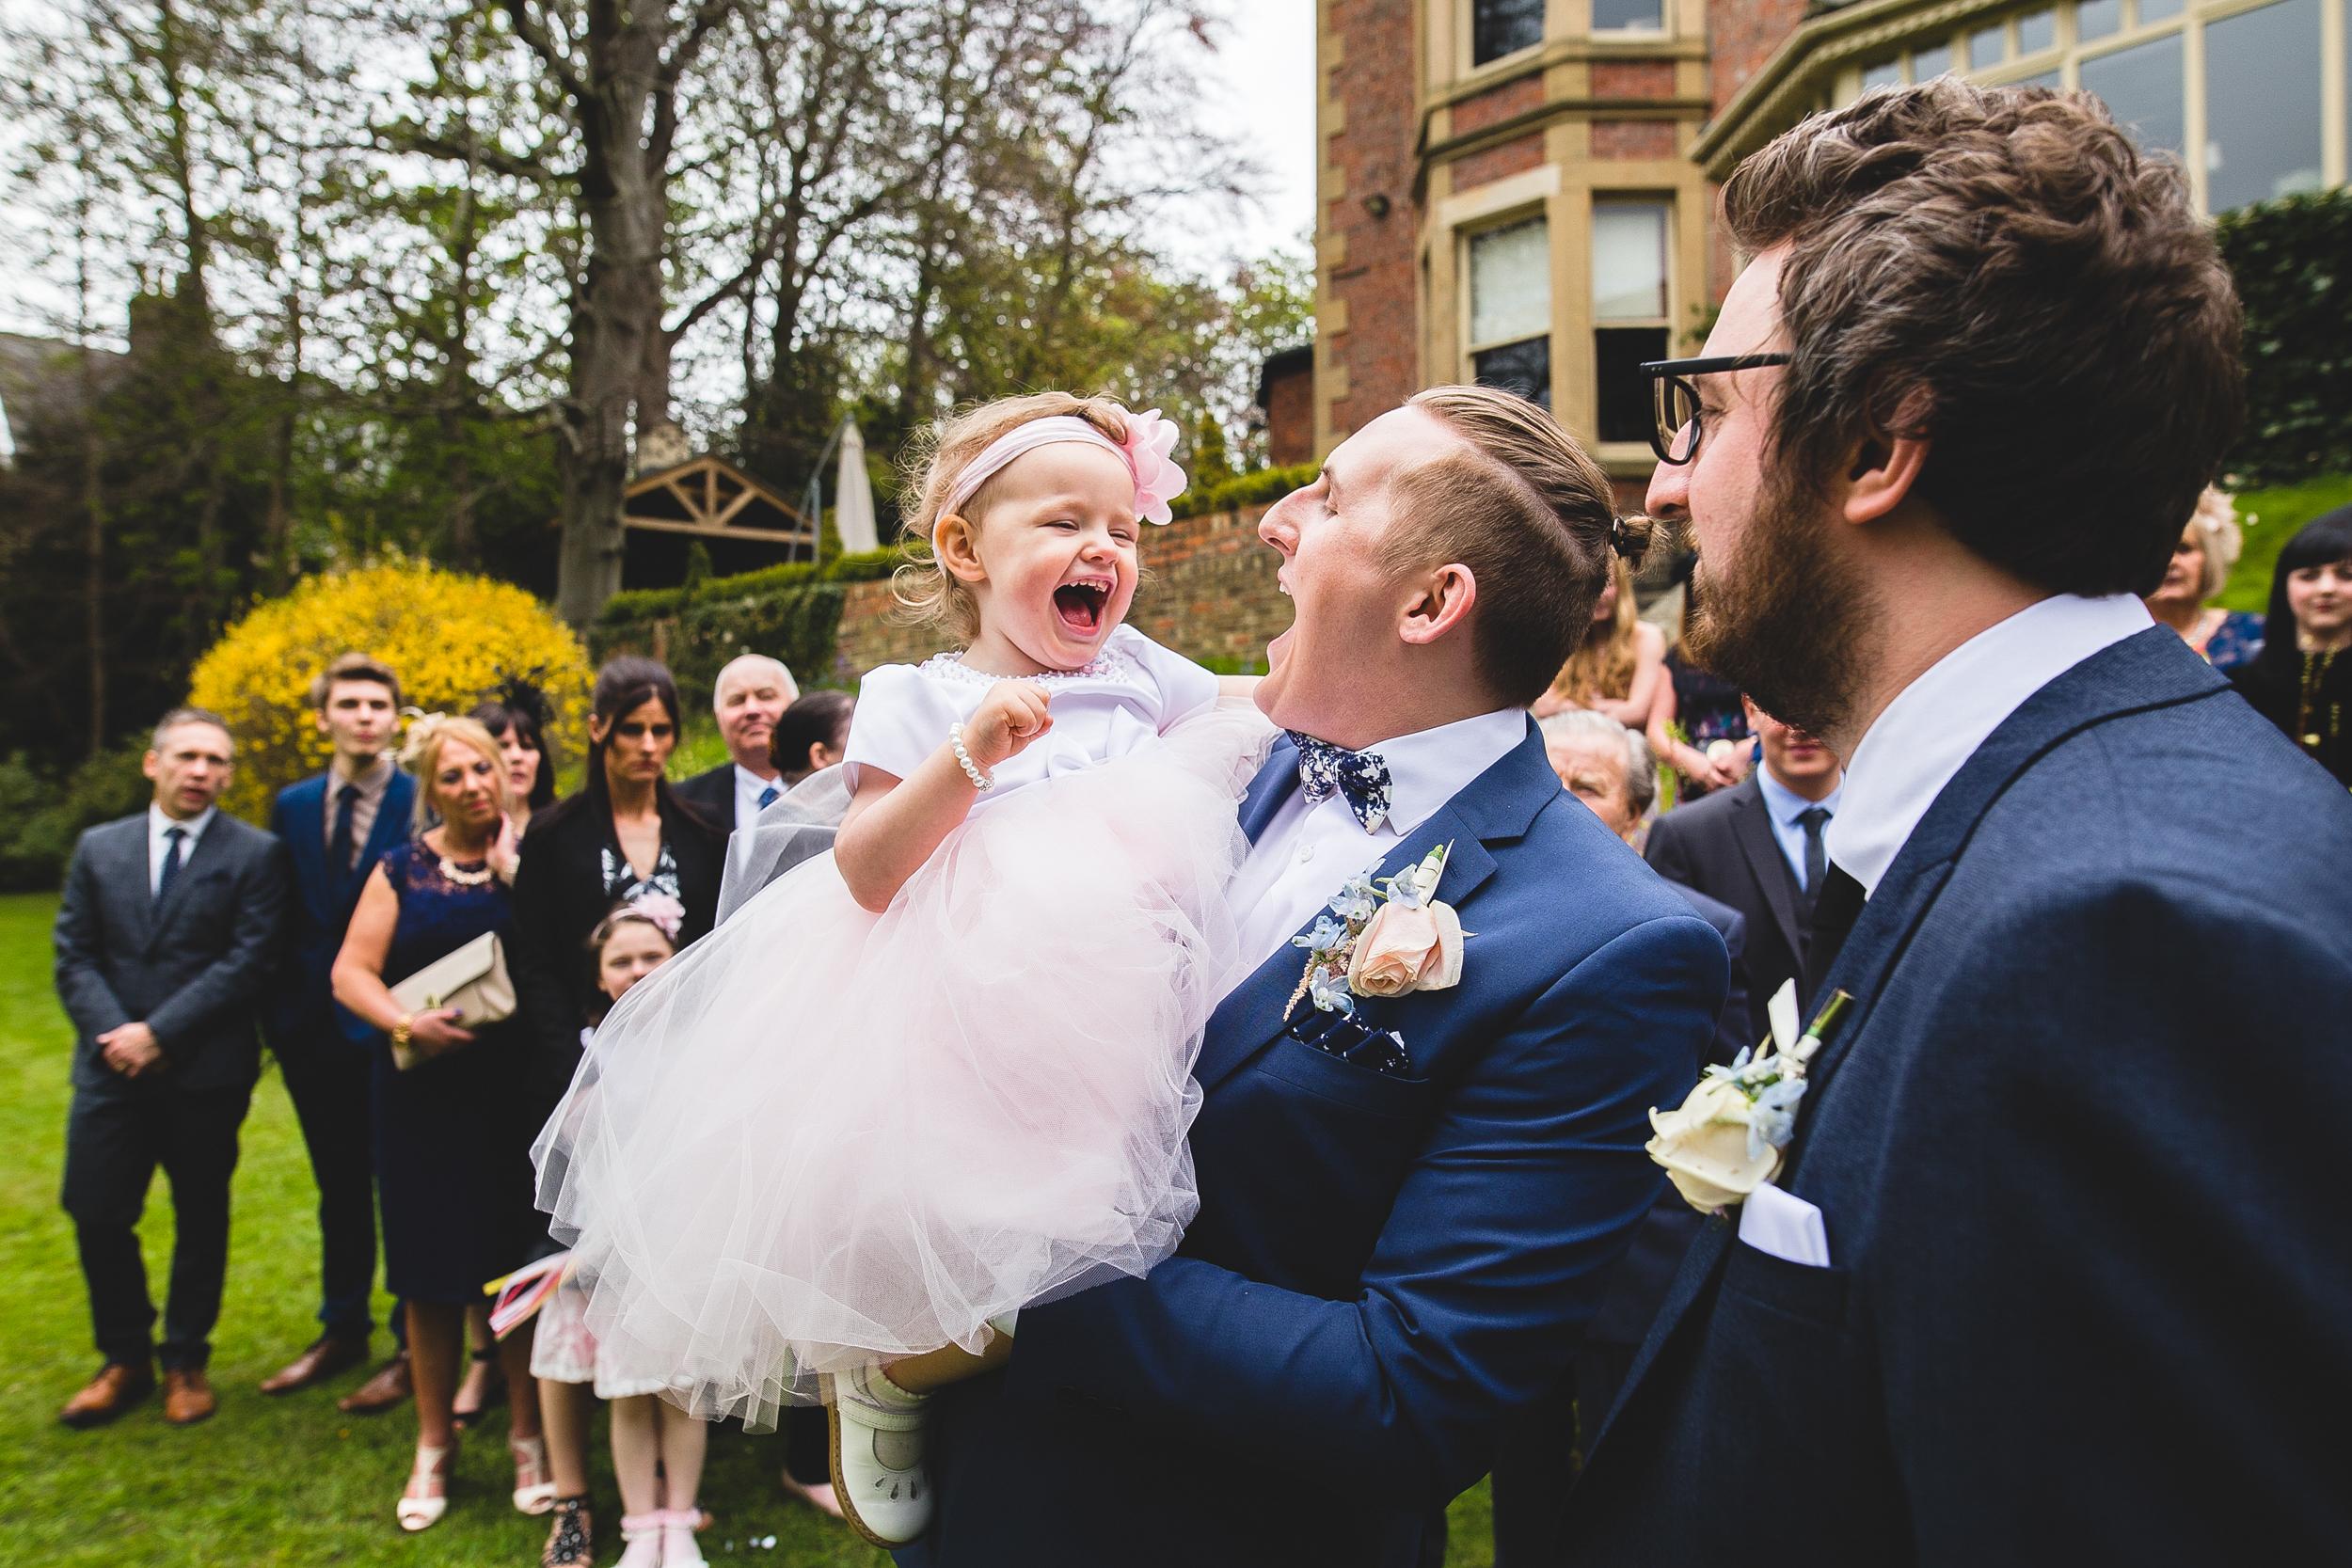 creative-wedding-photography-teesside-north-east-yorkshire-102.jpg